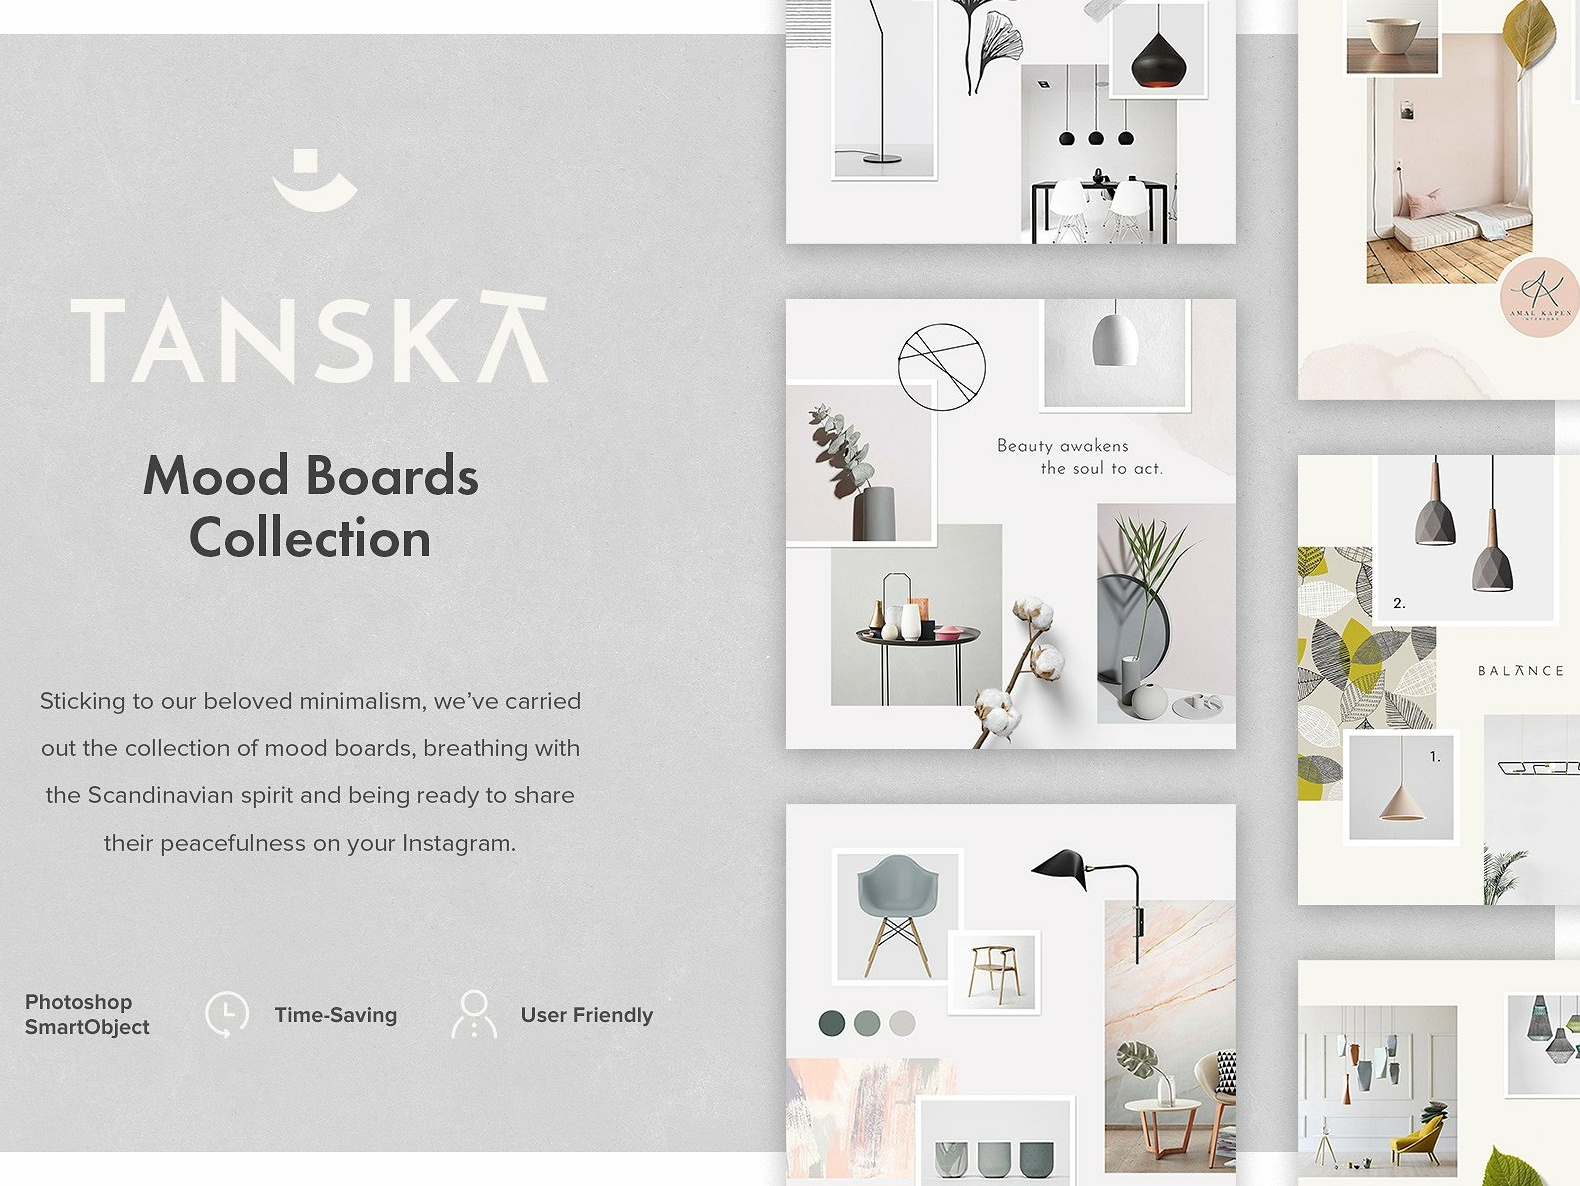 d4365fab15aa Tanska Mood Boards Collection by Social Media Templates   Dribbble ...